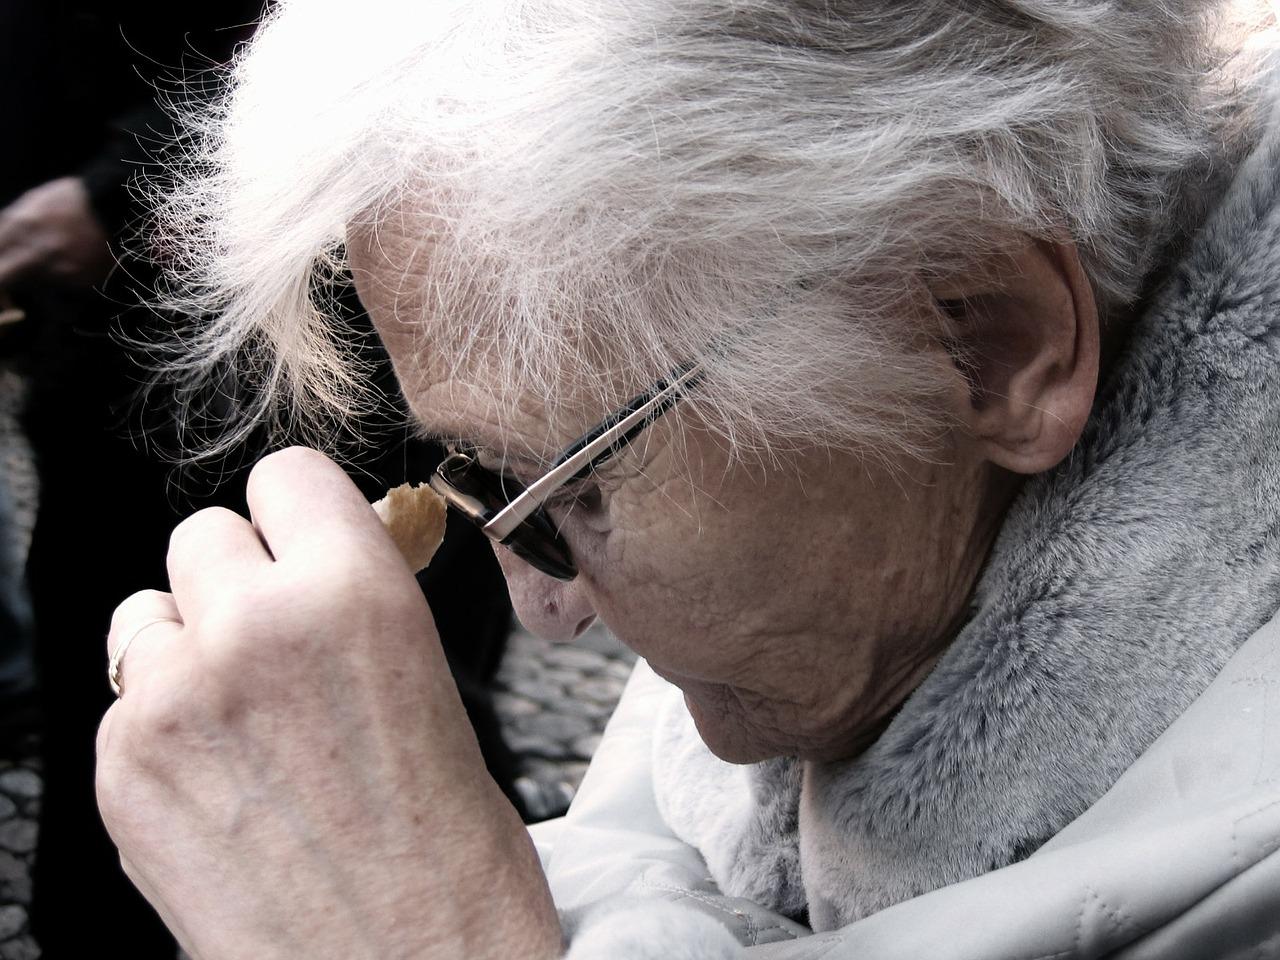 signes de la maladie d'Alzheimer